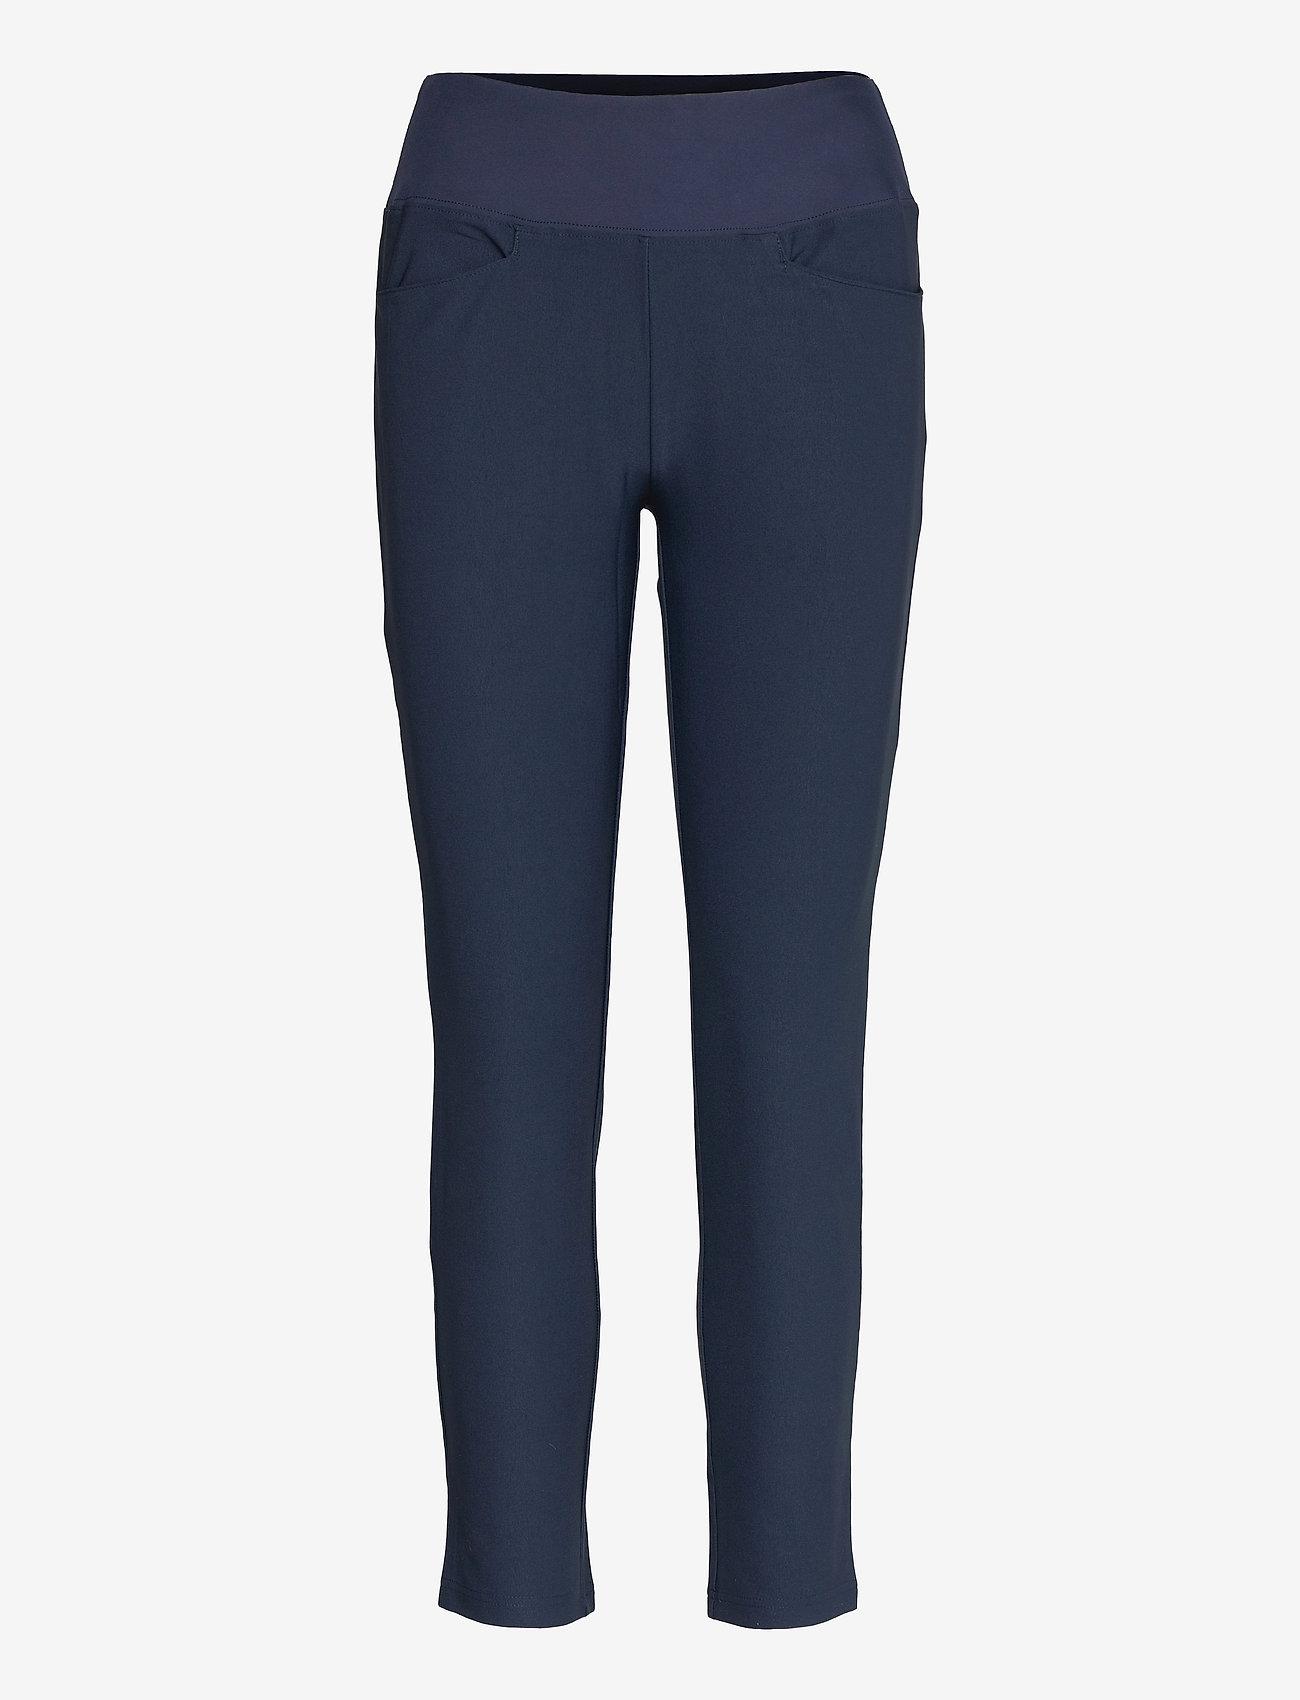 PUMA Golf - PWRSHAPE Pant - golfbroeken - navy blazer - 0